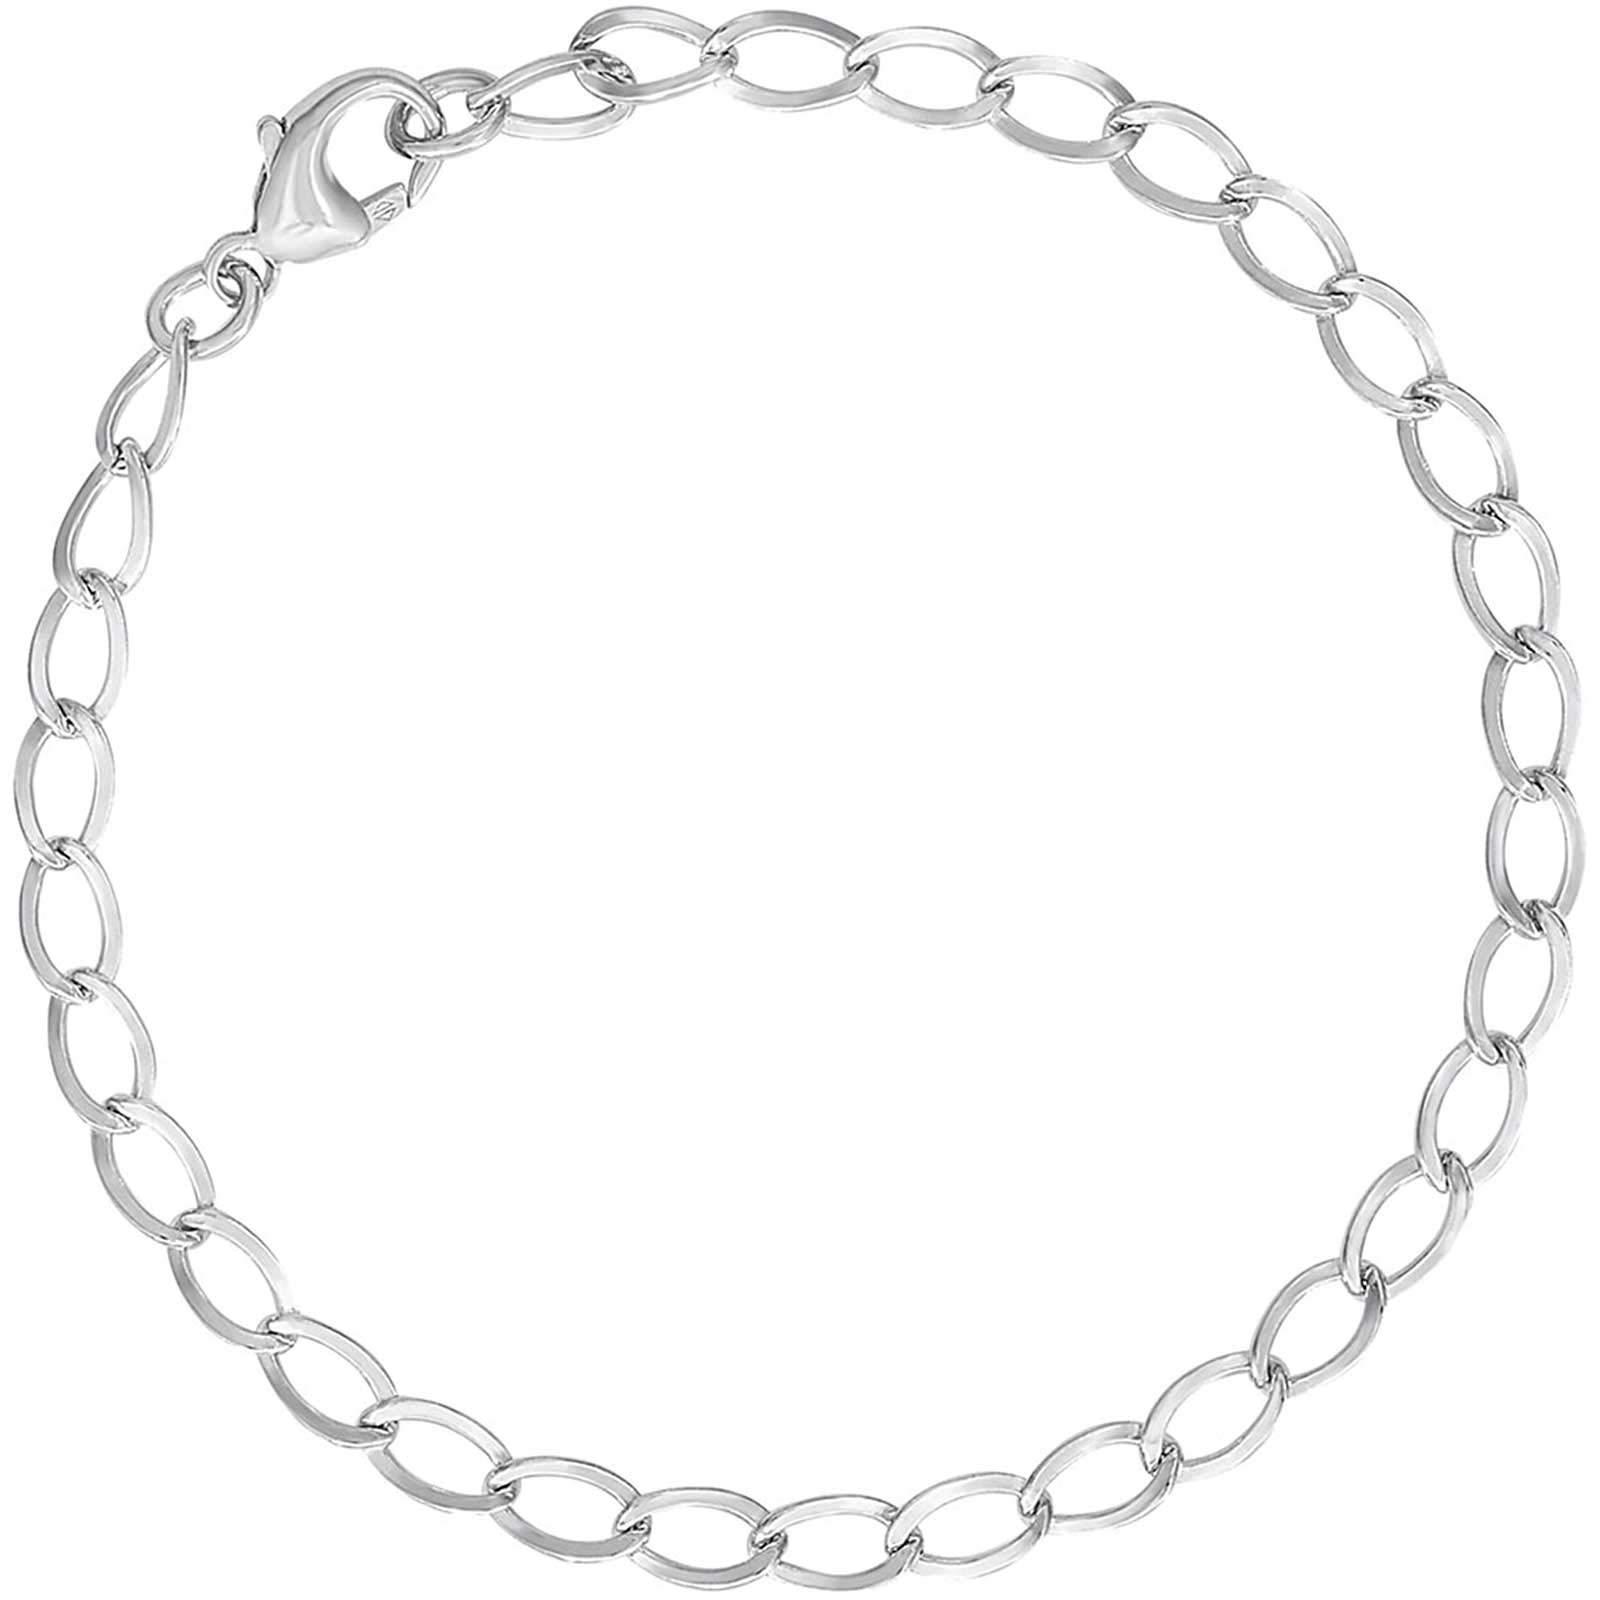 Rembrandt Charms 8'' Charm Bracelet, Sterling Silver